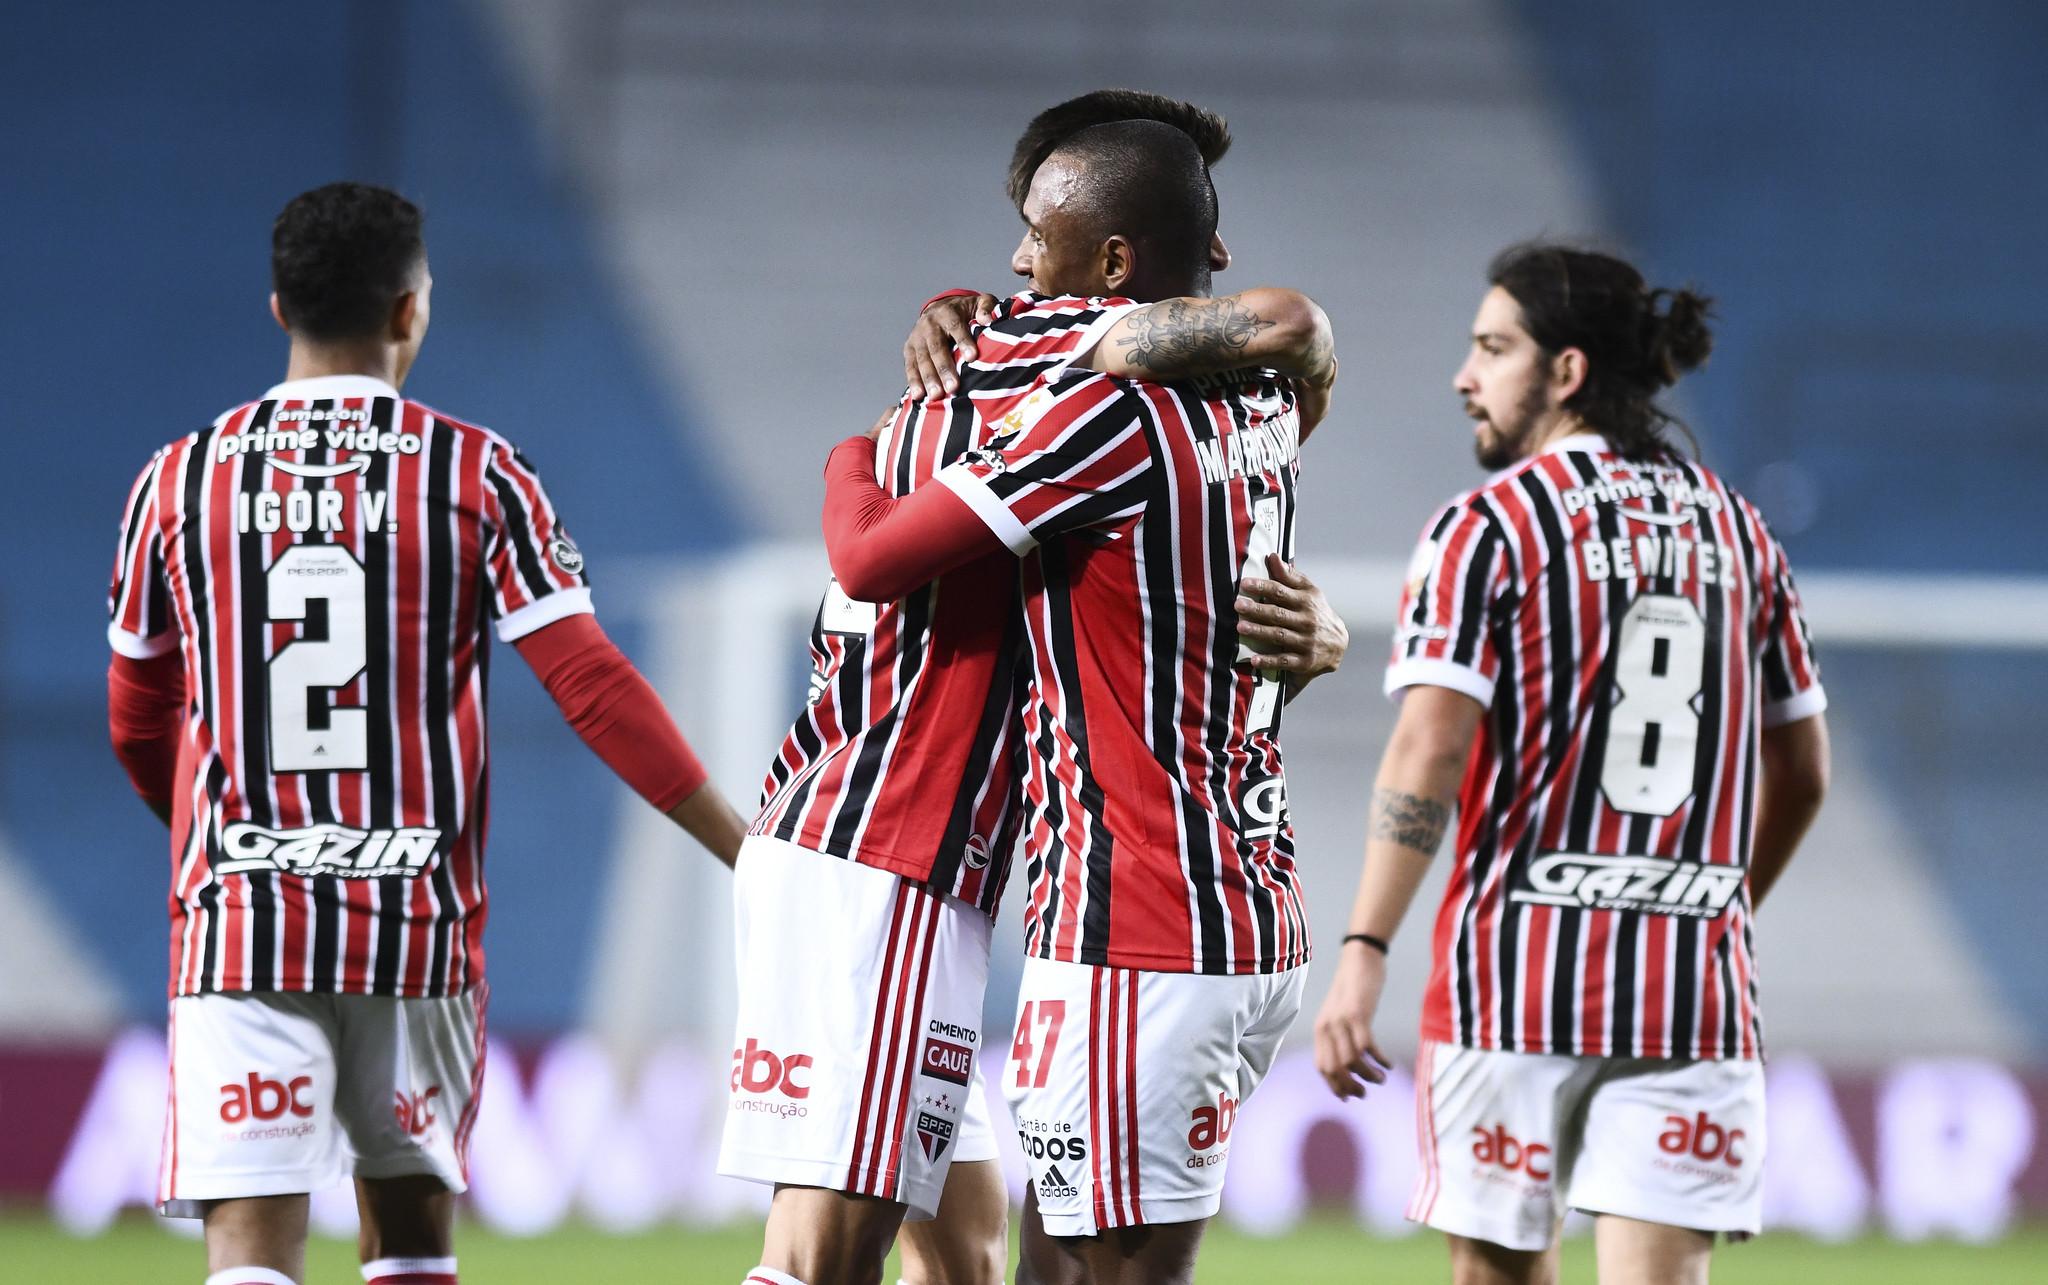 Na Argentina, Tricolor elimina o Racing e avança na Conmebol Libertadores